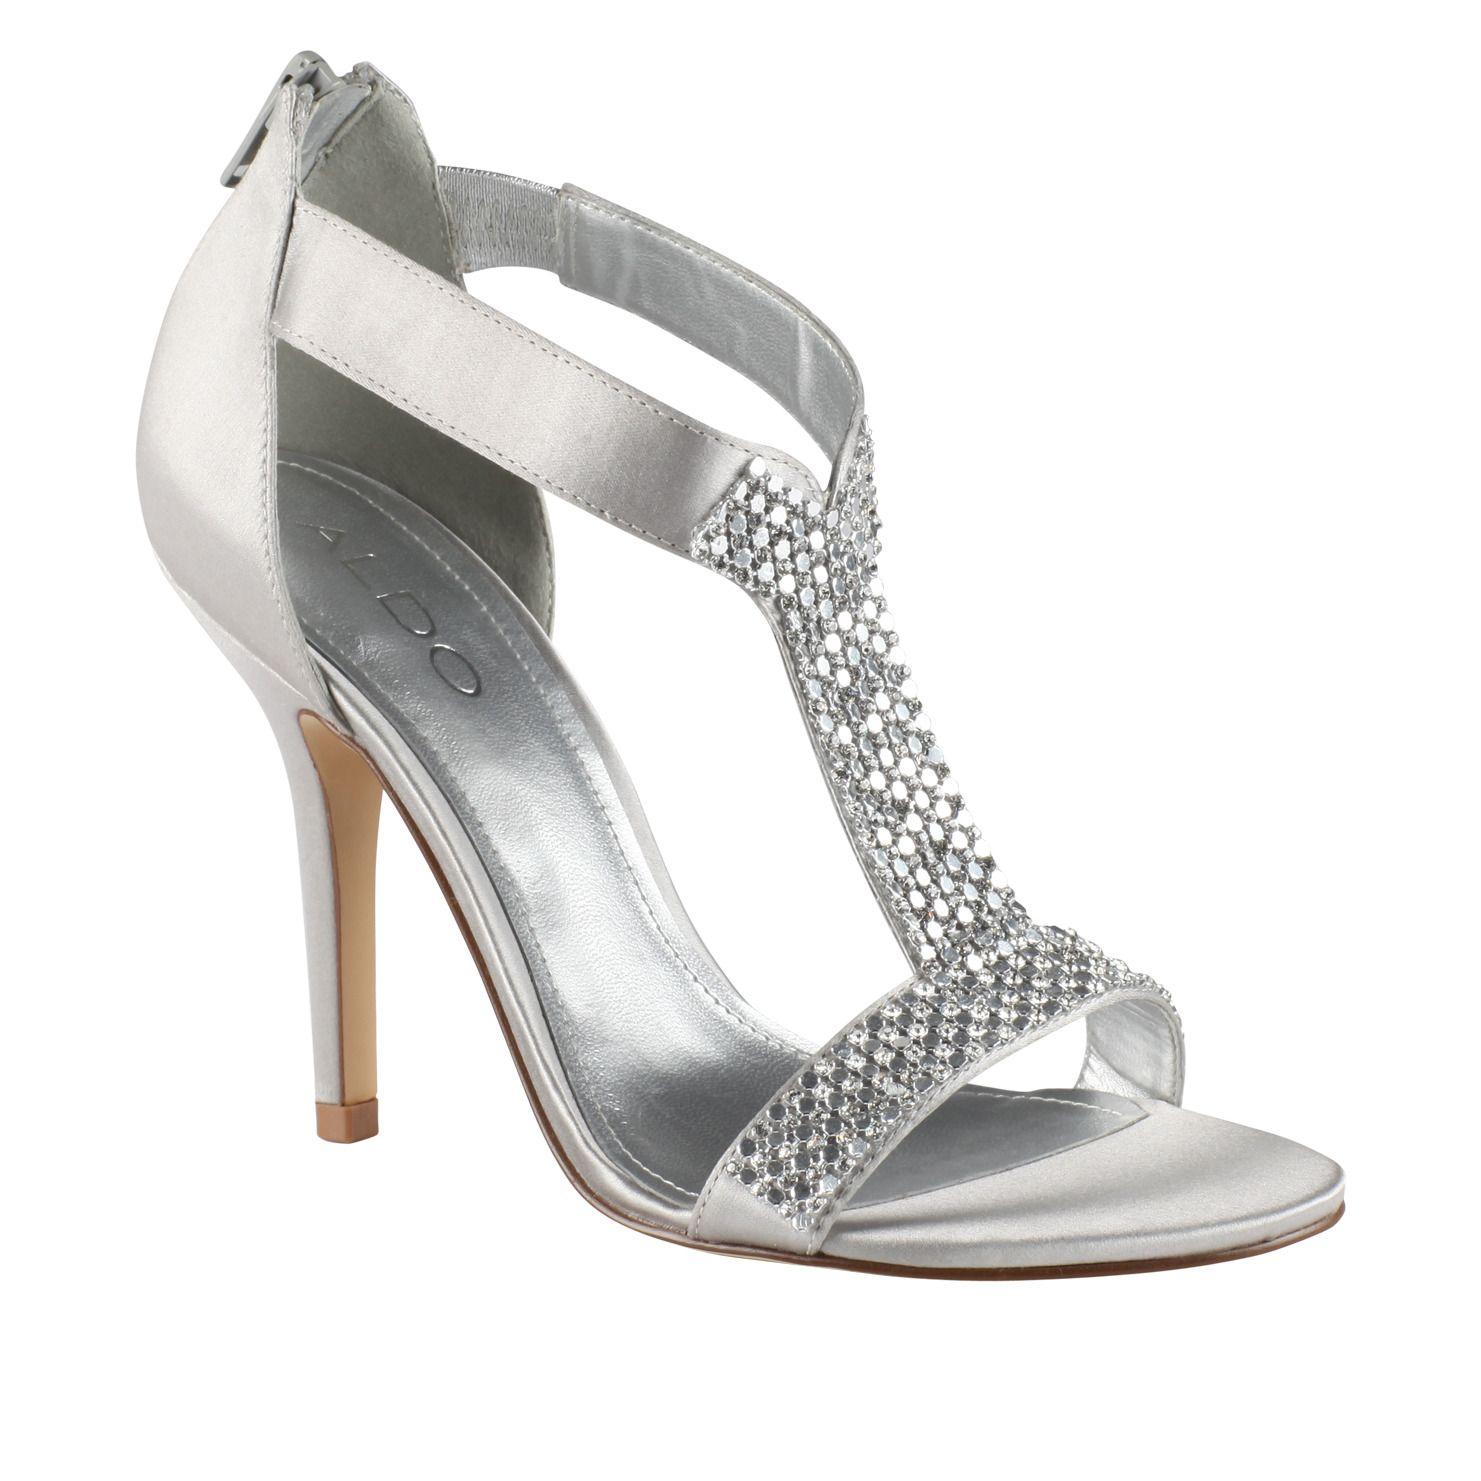 Bridal Shoes Aldo: Womens Special Occasion Sandals For Sale At ALDO